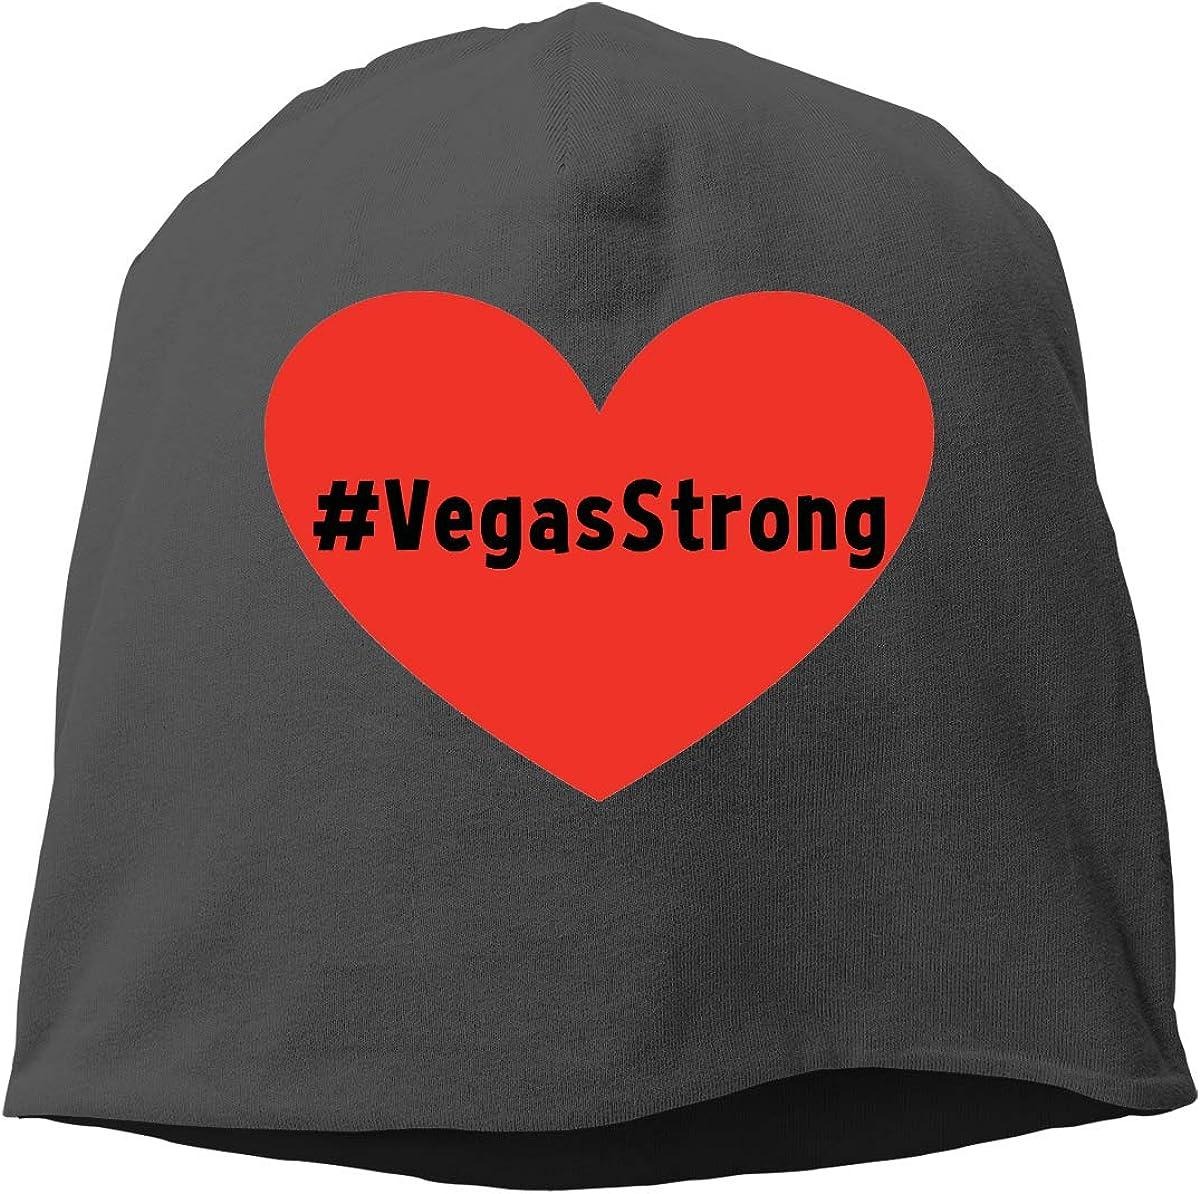 Las Vegas Strong Unisex Knitted Hat Beanie Hat Warm Hats Skull Cap